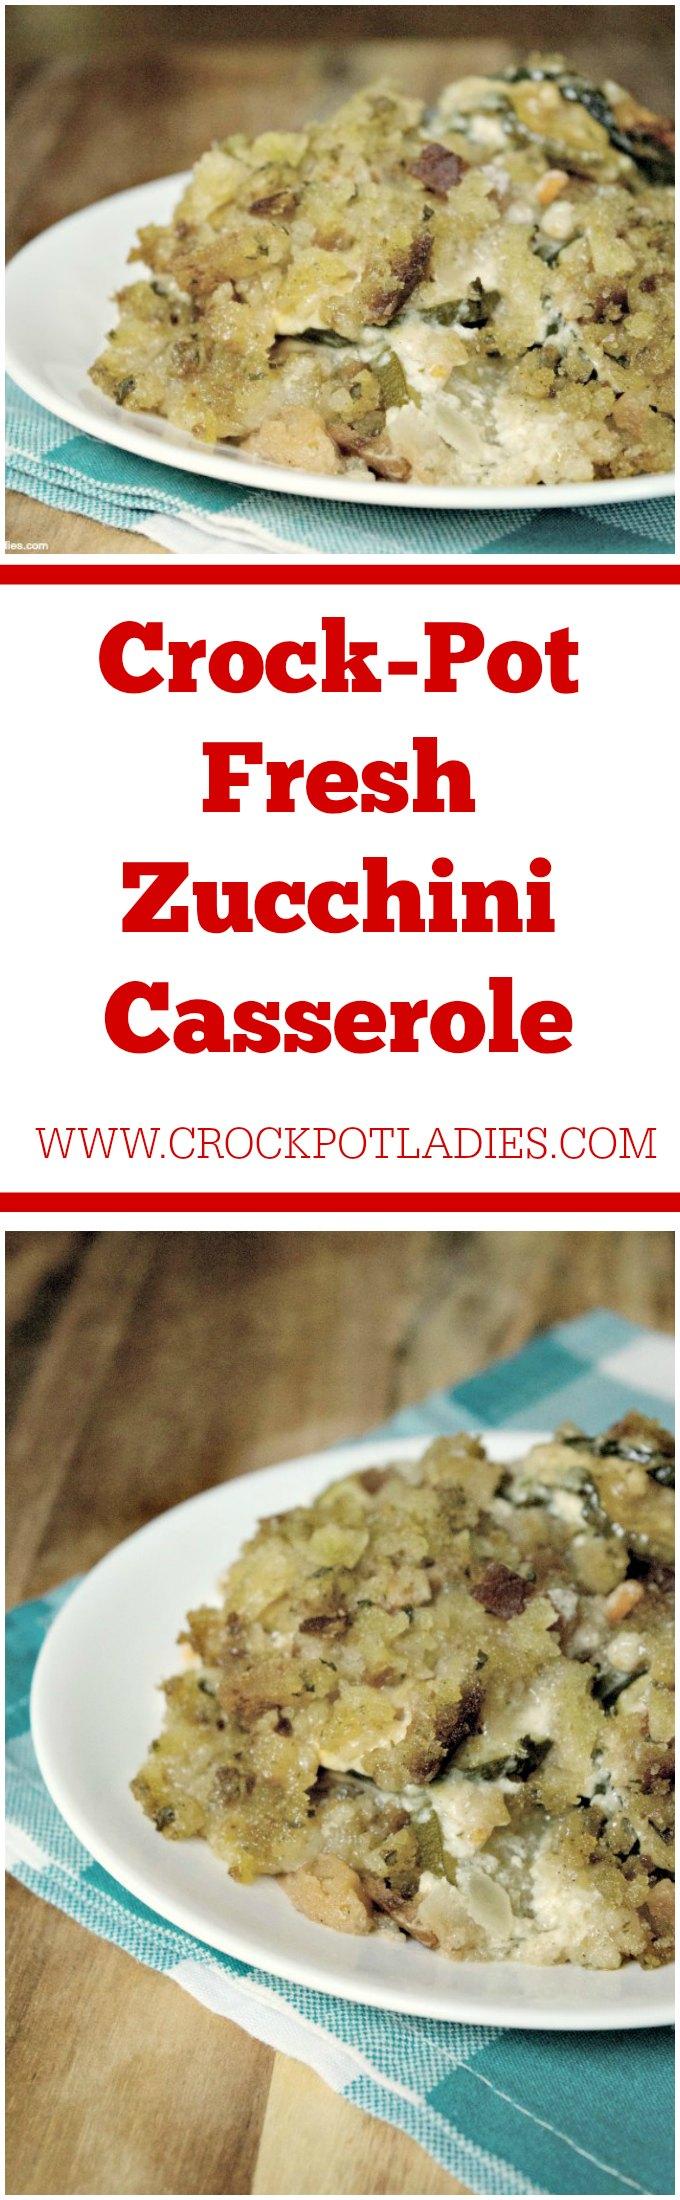 Crock-Pot Fresh Zucchini Casserole